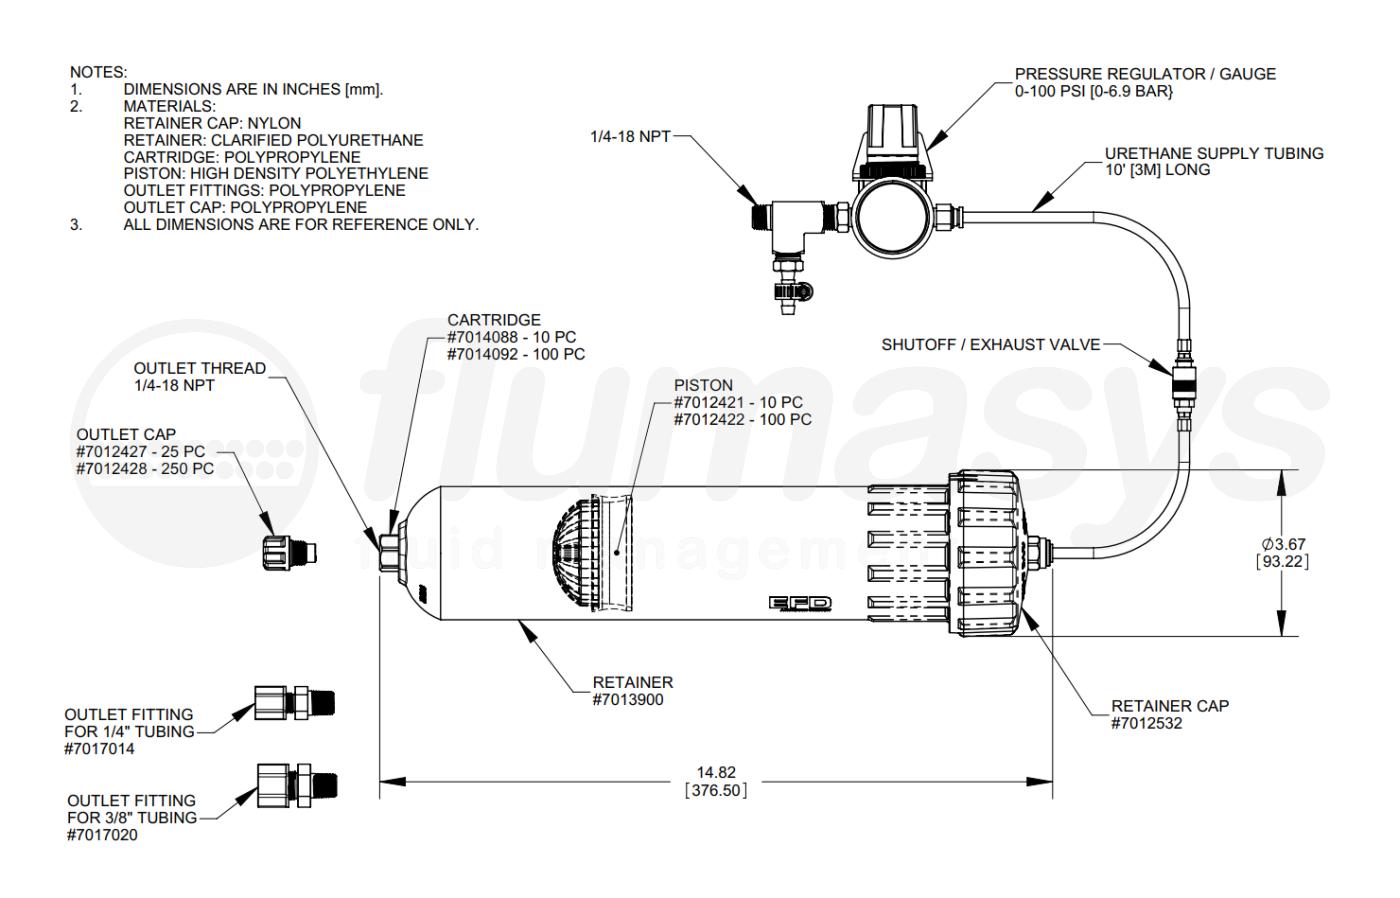 7014100_NordsonEFD_Optimum_retainer_system_32OZ_0-7bar_drawing